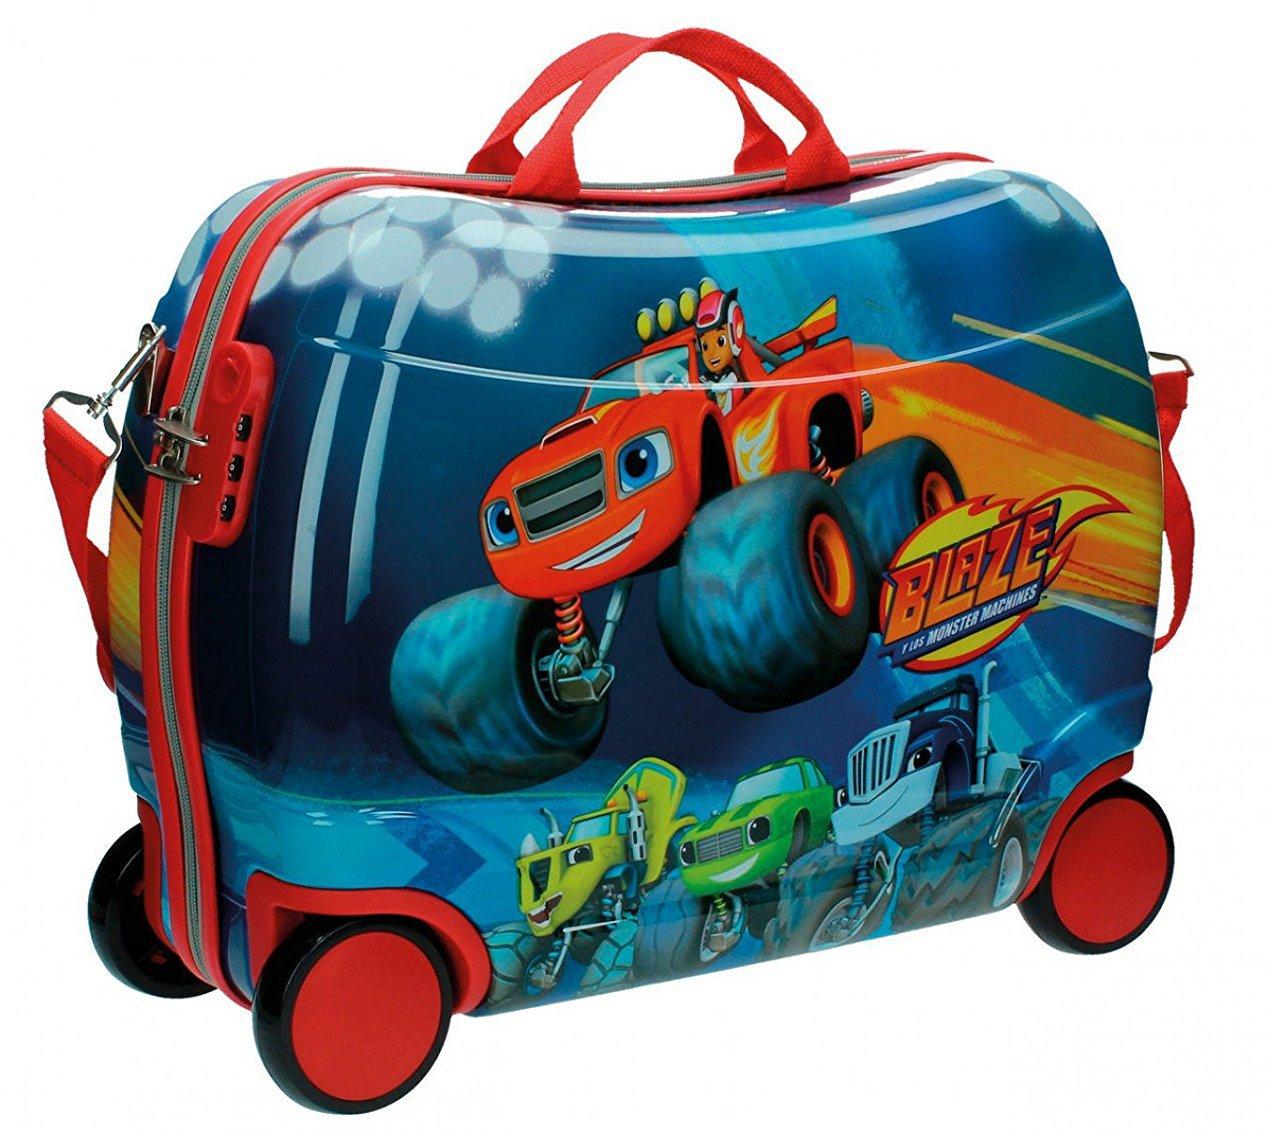 Blaze Race Kindergepäck, 50 cm, 34 liters, Blau (Azul)